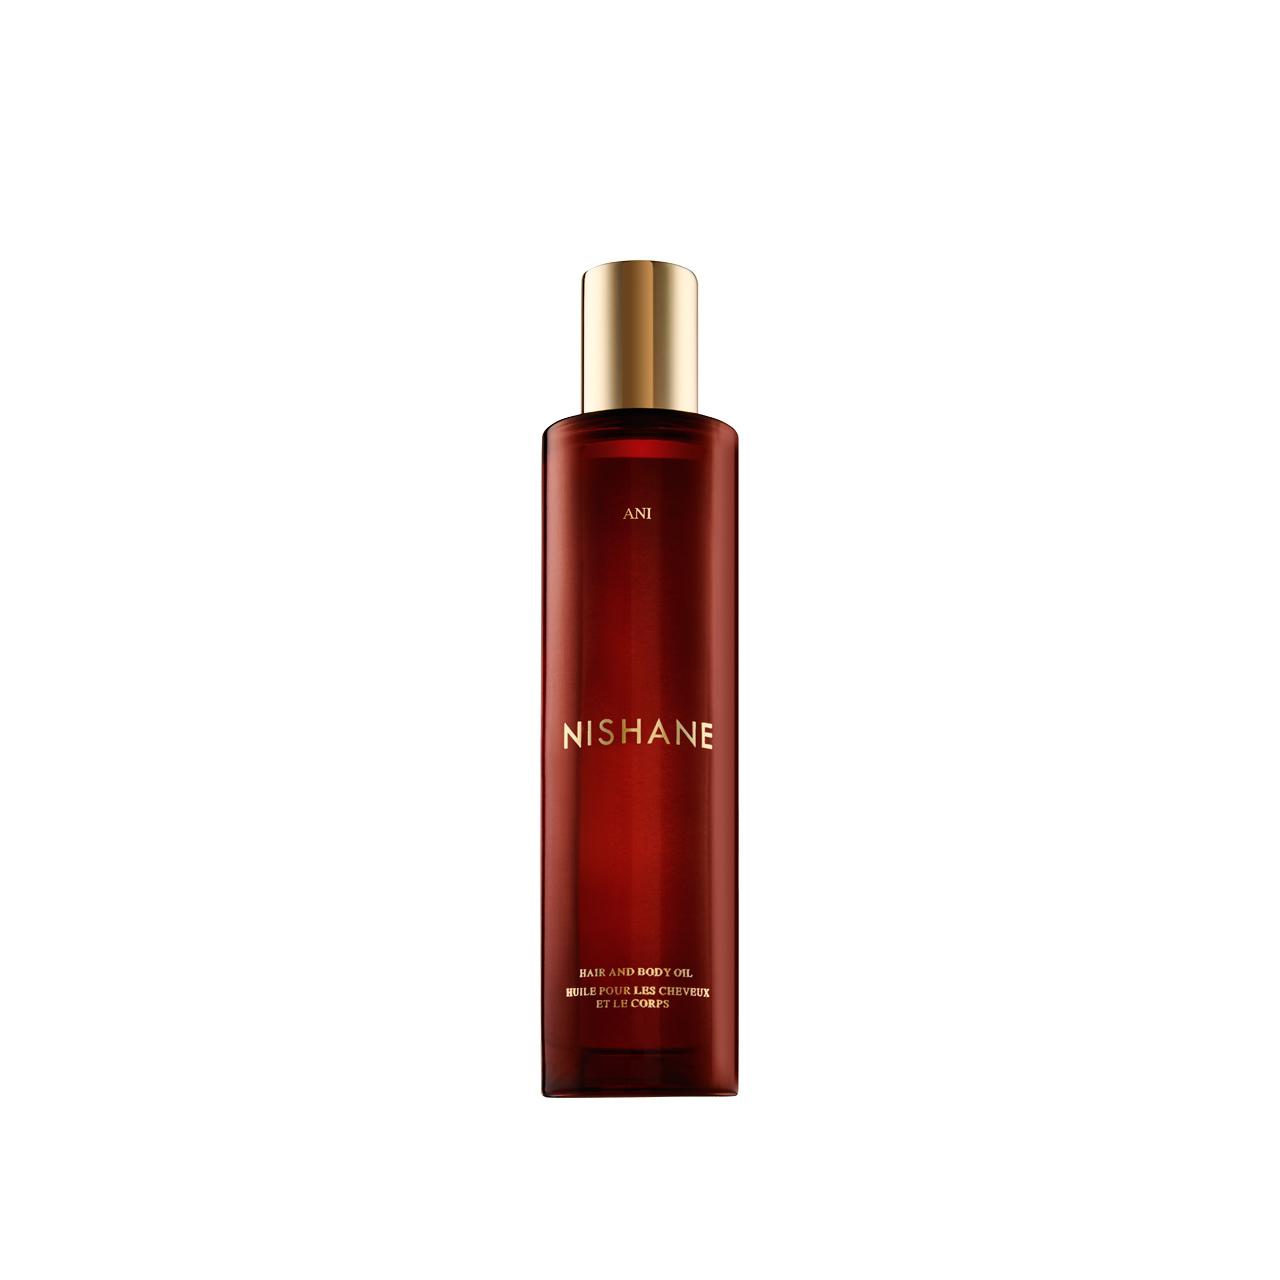 Ani - Hair & Body Oil